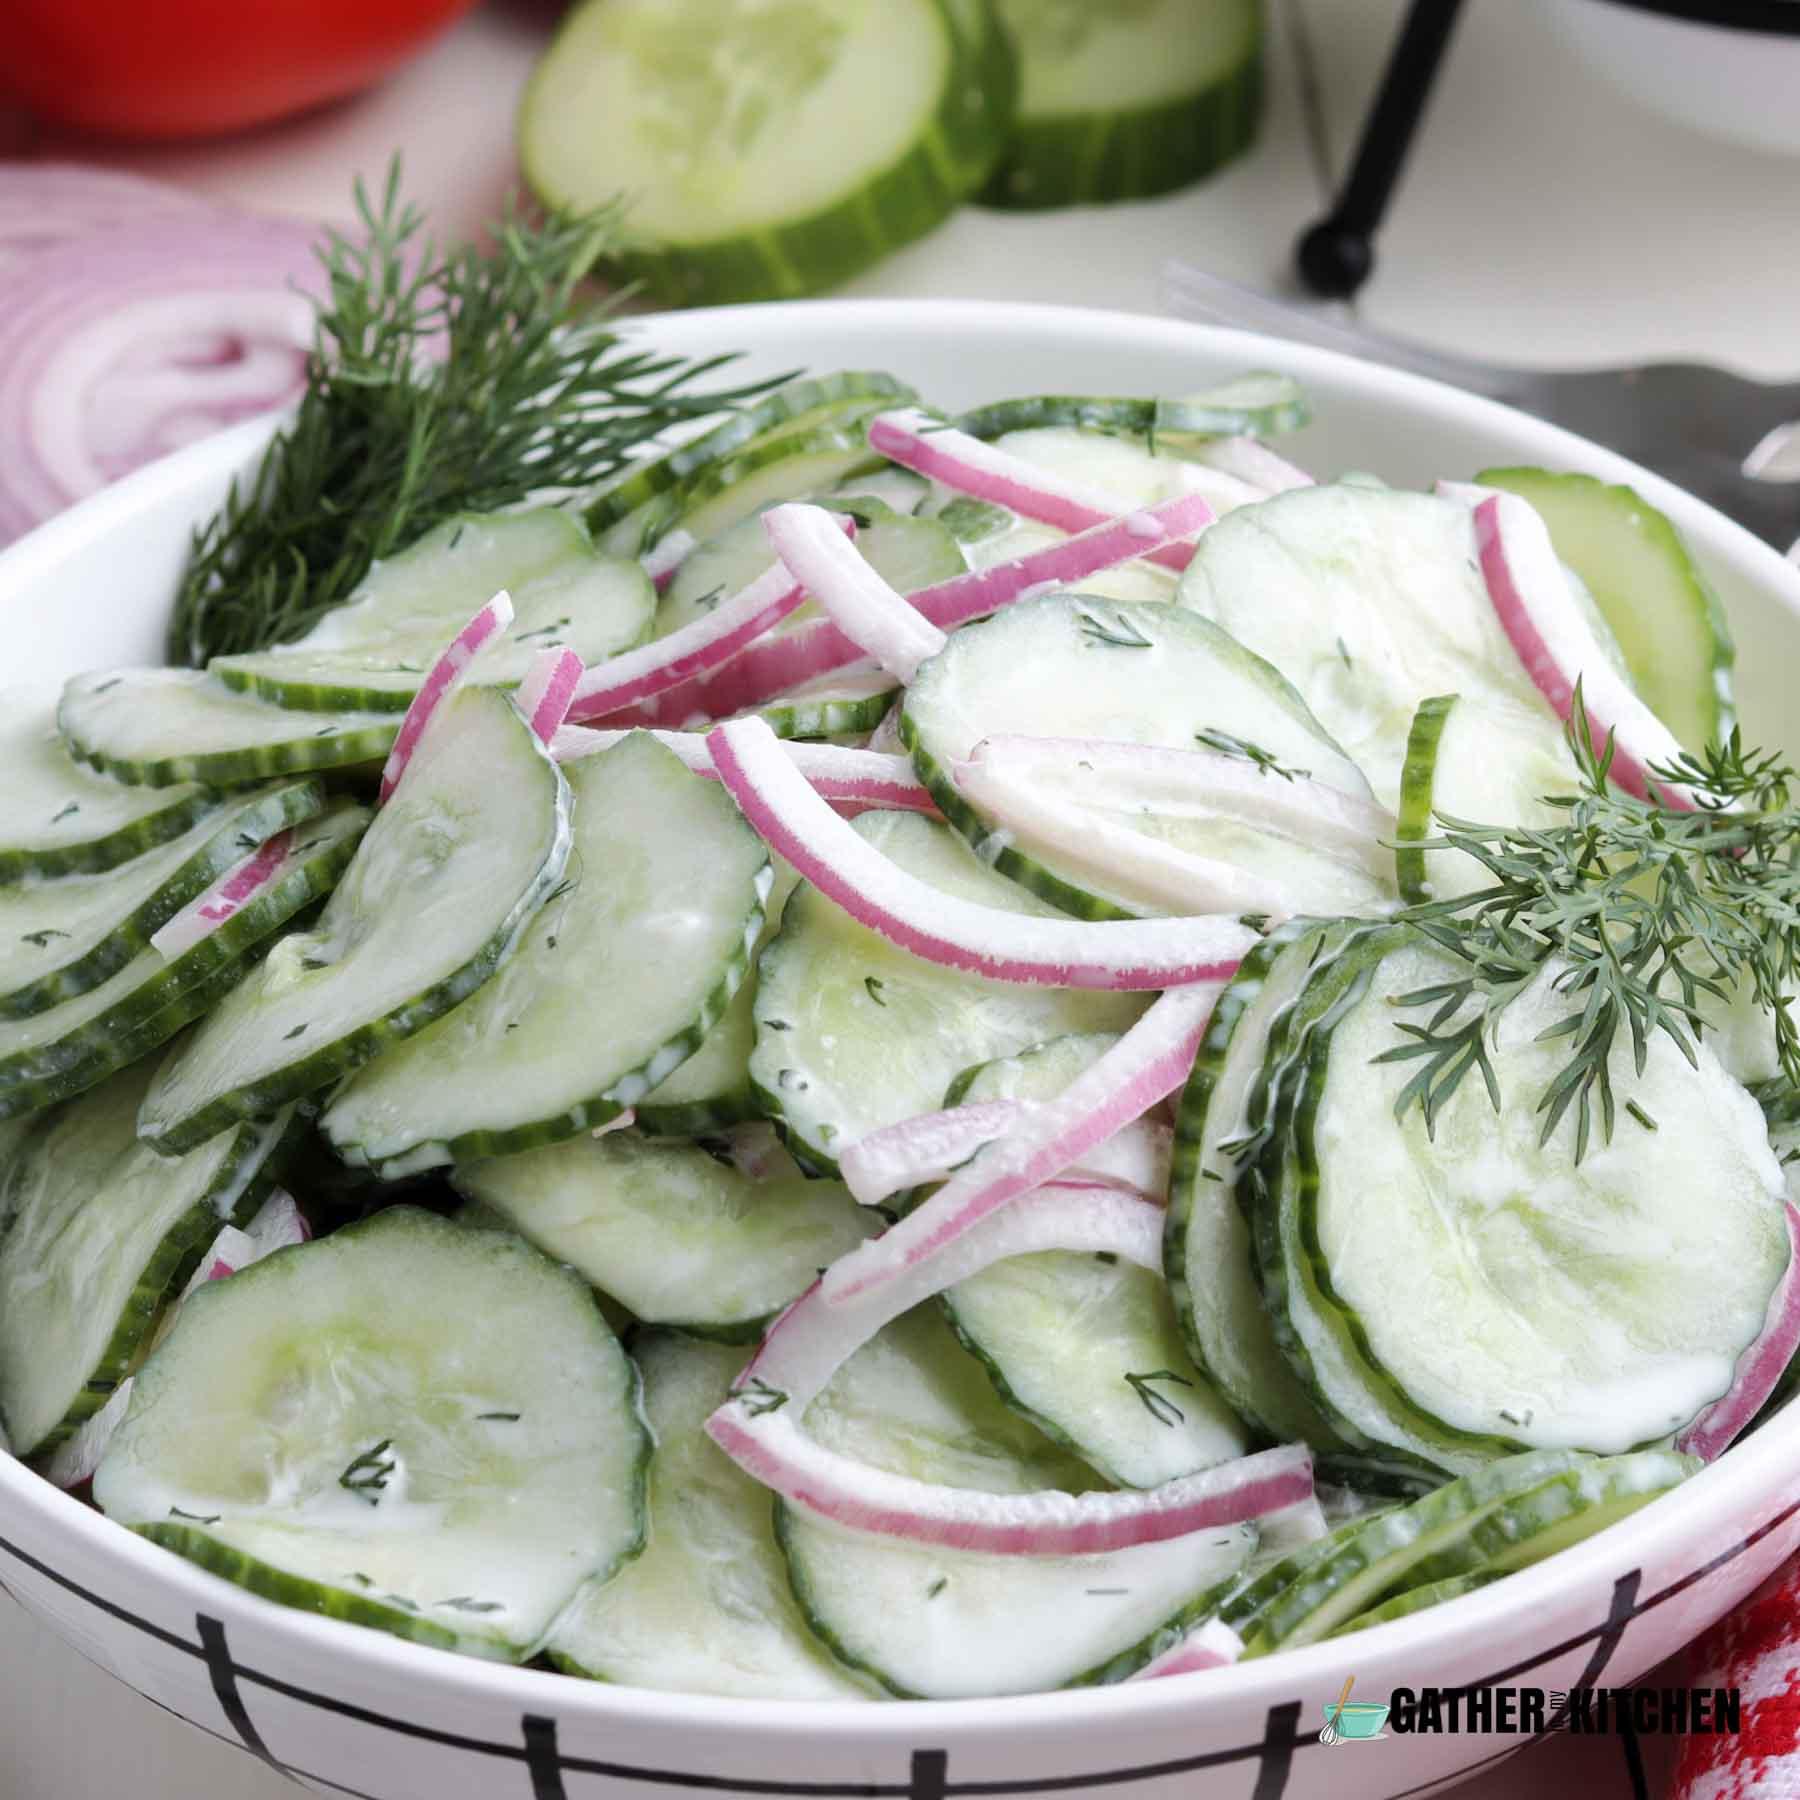 Creamy cucumber salad in a bowl.